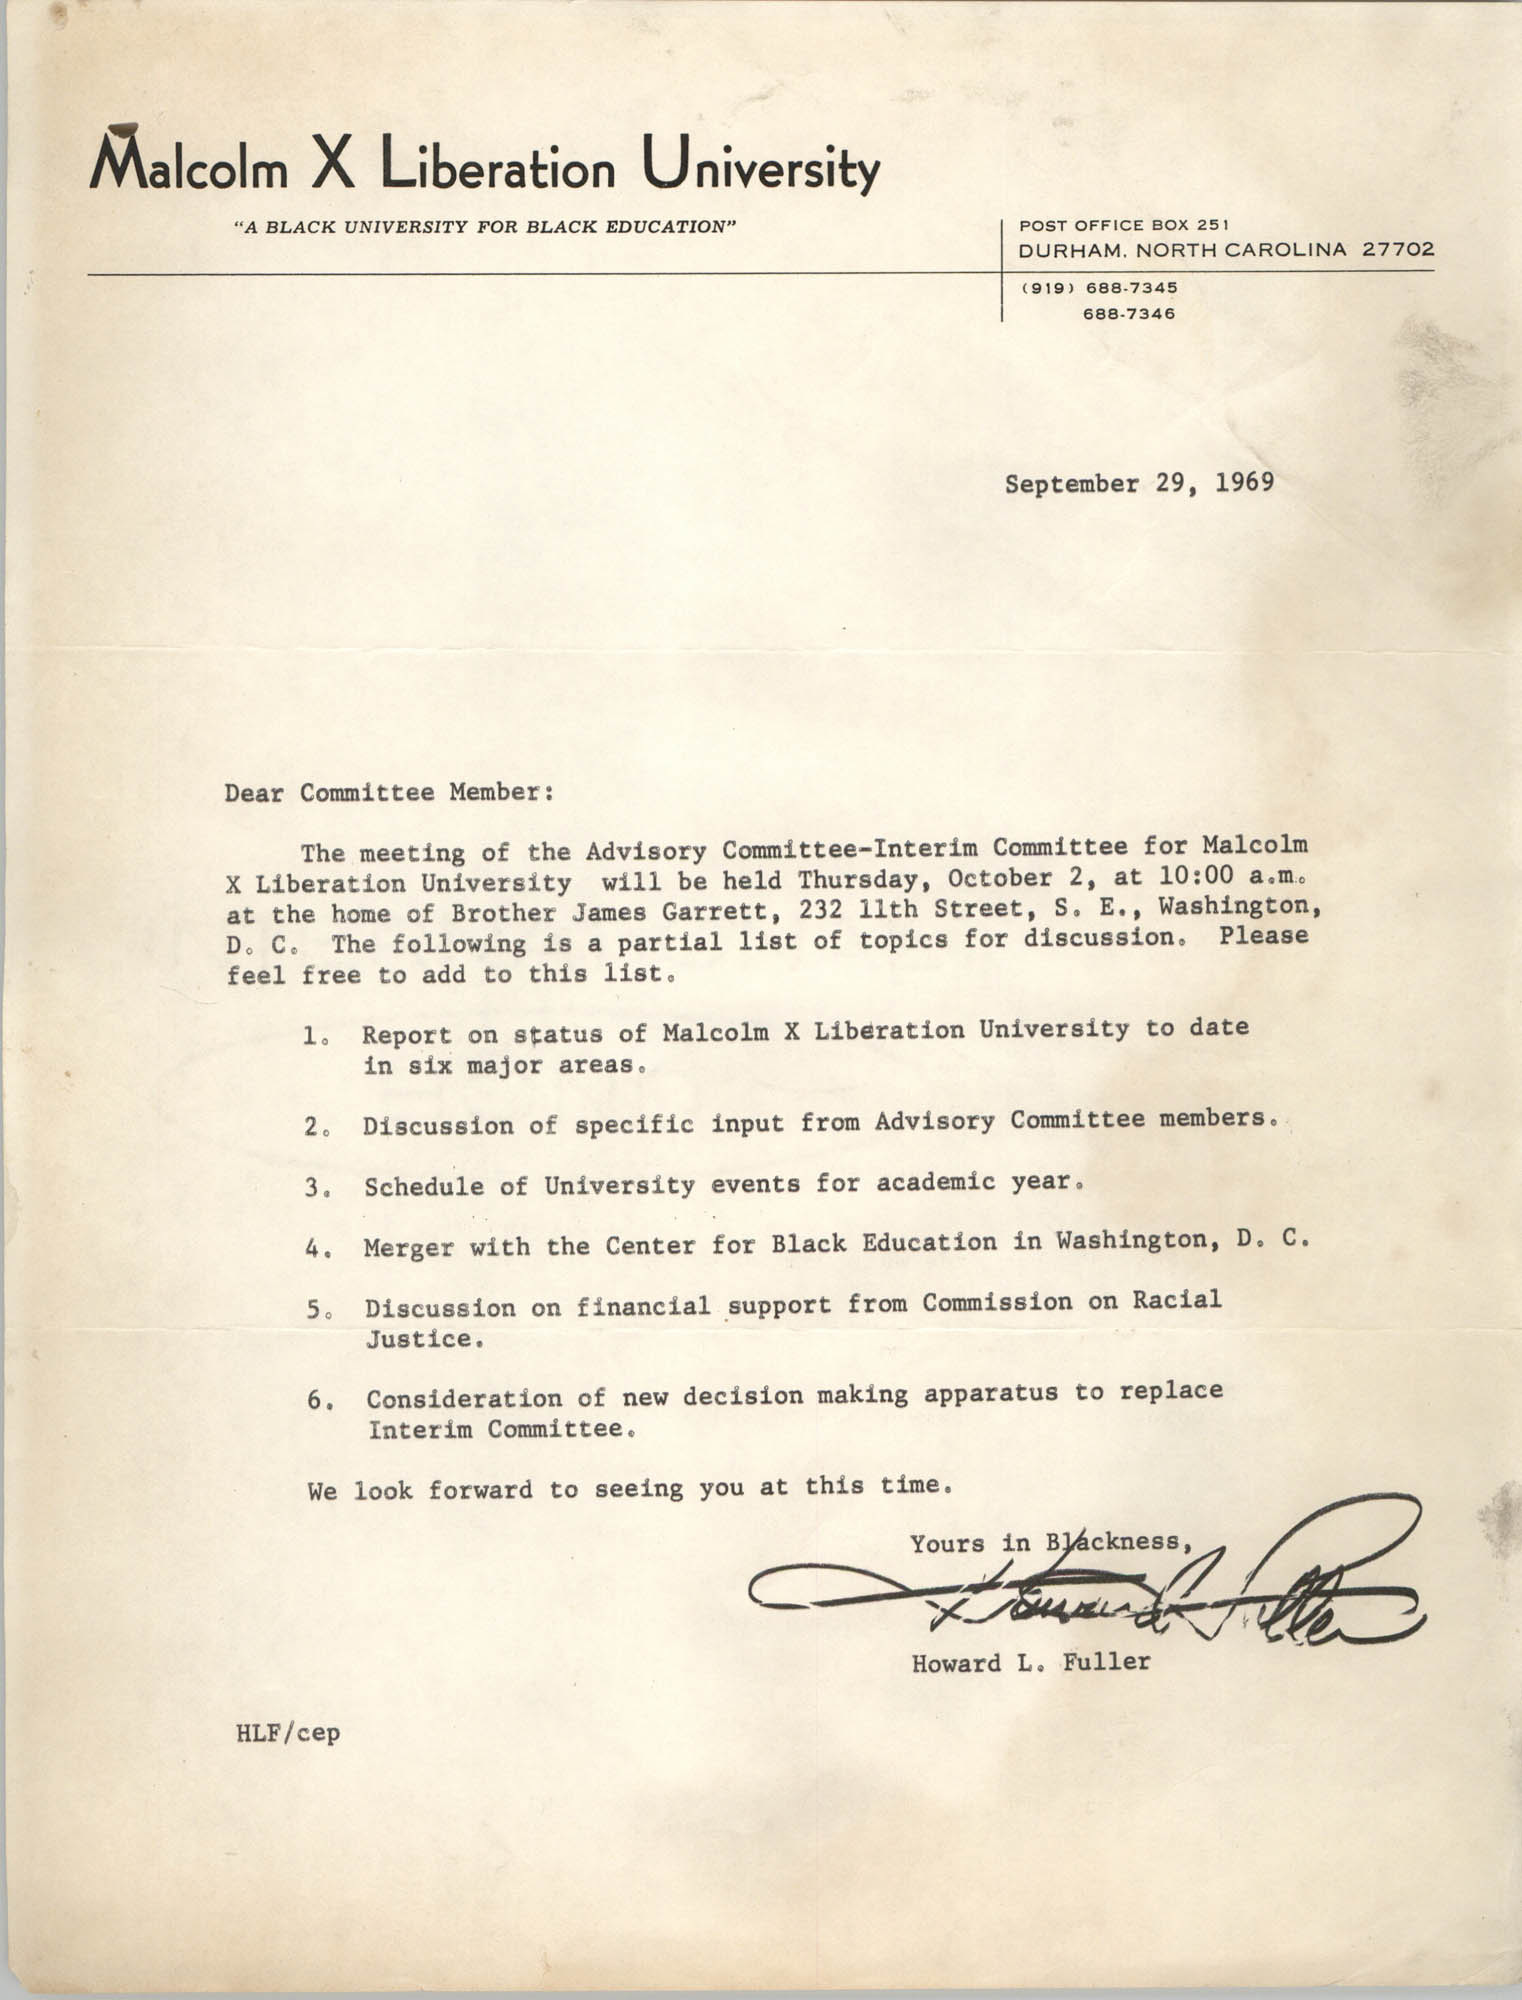 Malcolm X Liberation University Memorandum, September 29, 1969